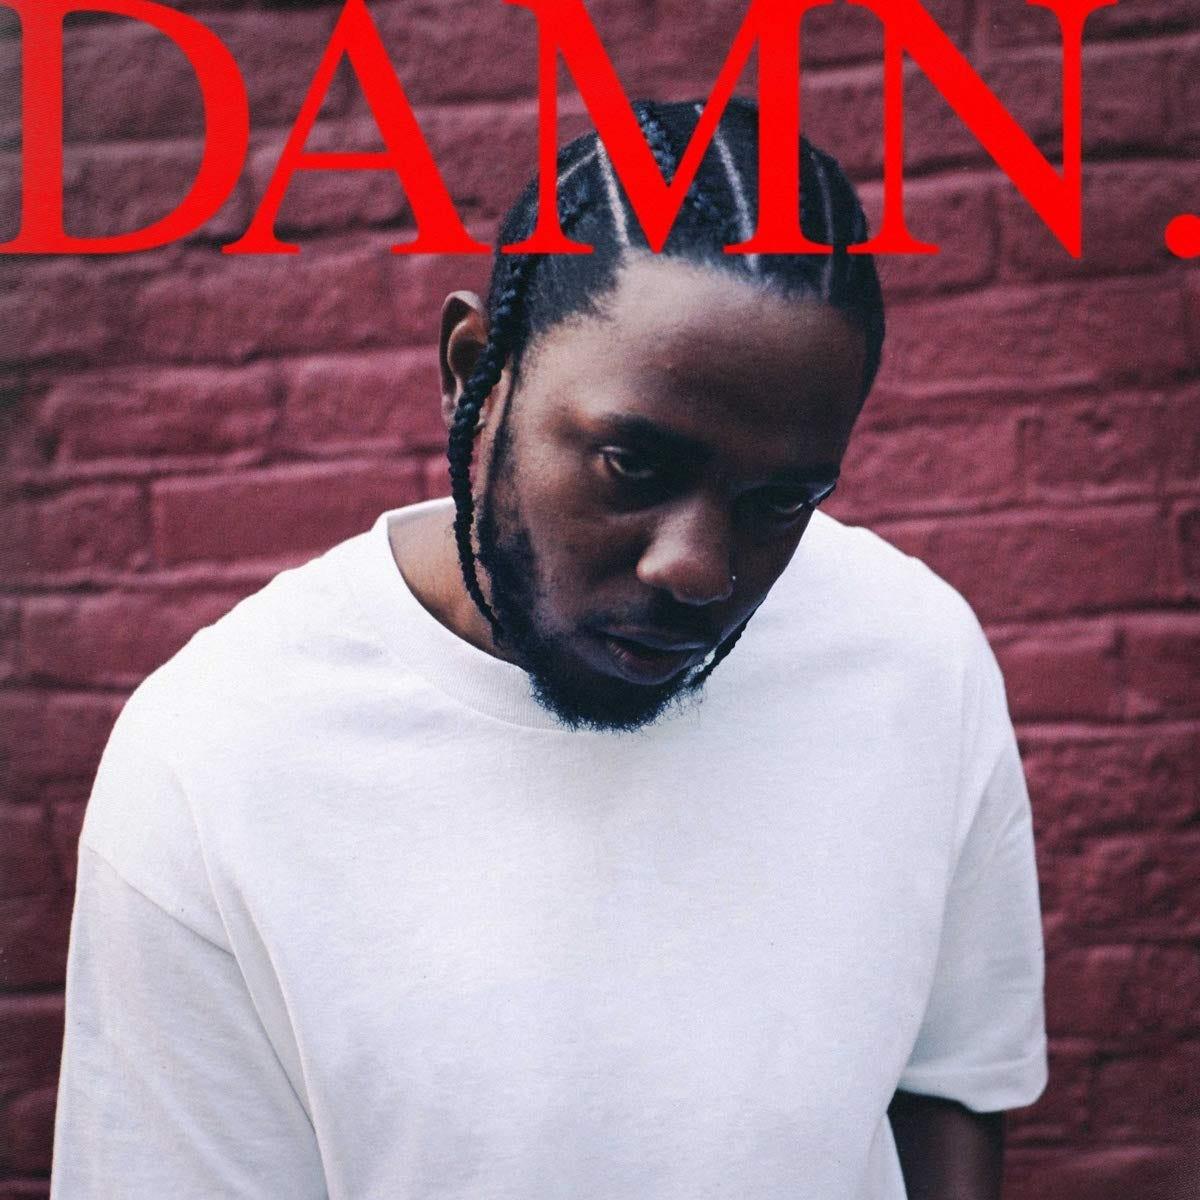 Kendrick Lamar - DAMN. [2 LP] - Amazon.com Music